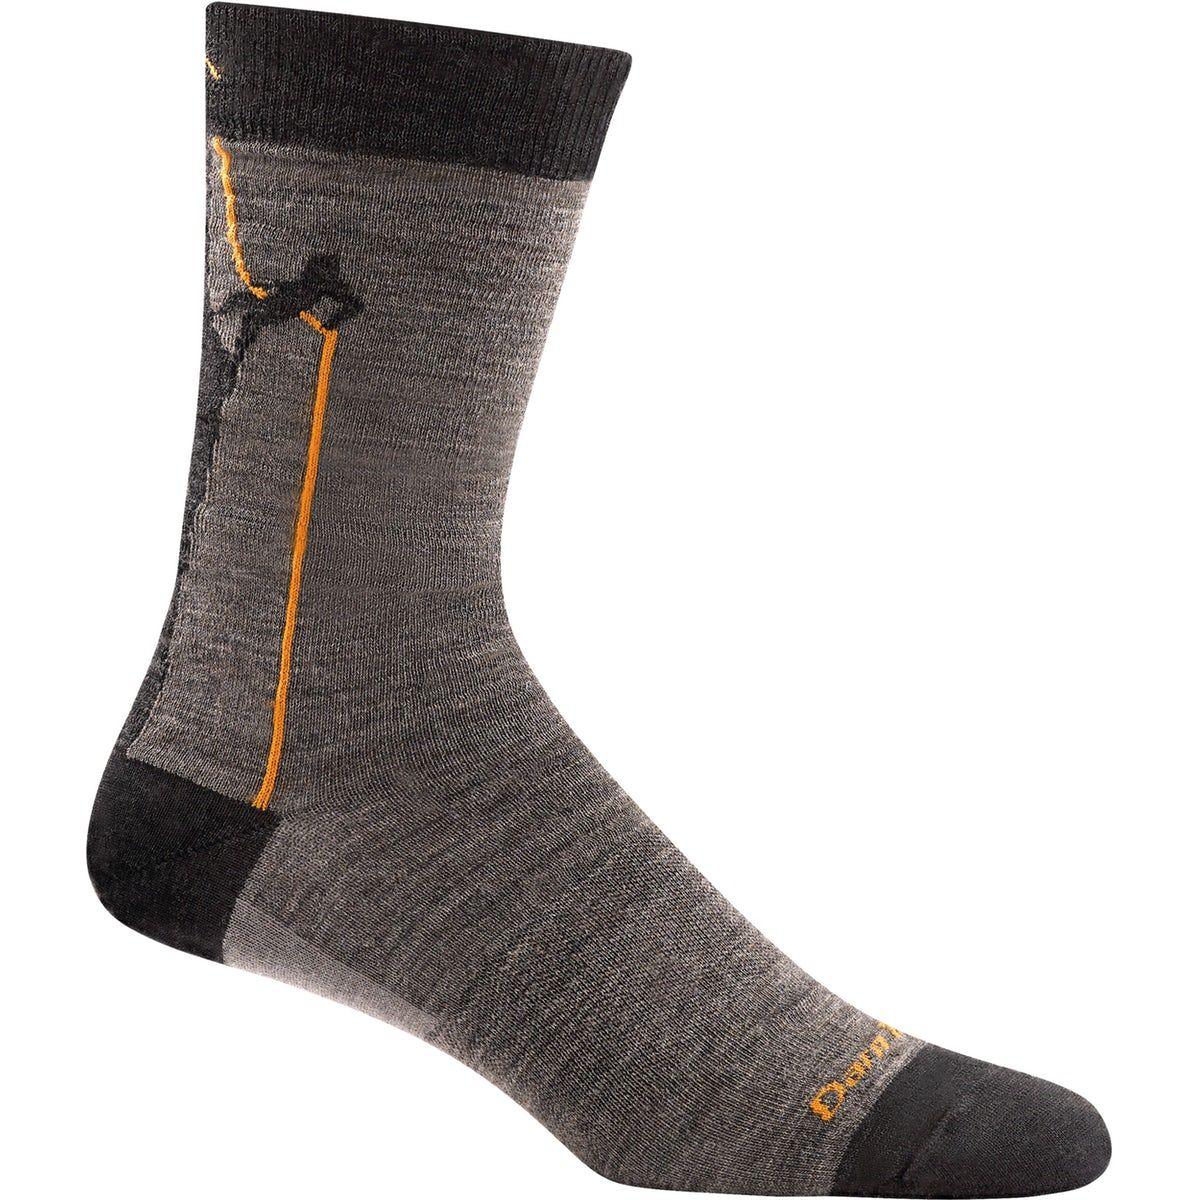 Darn tough climber guy crew socks unisex mec mens